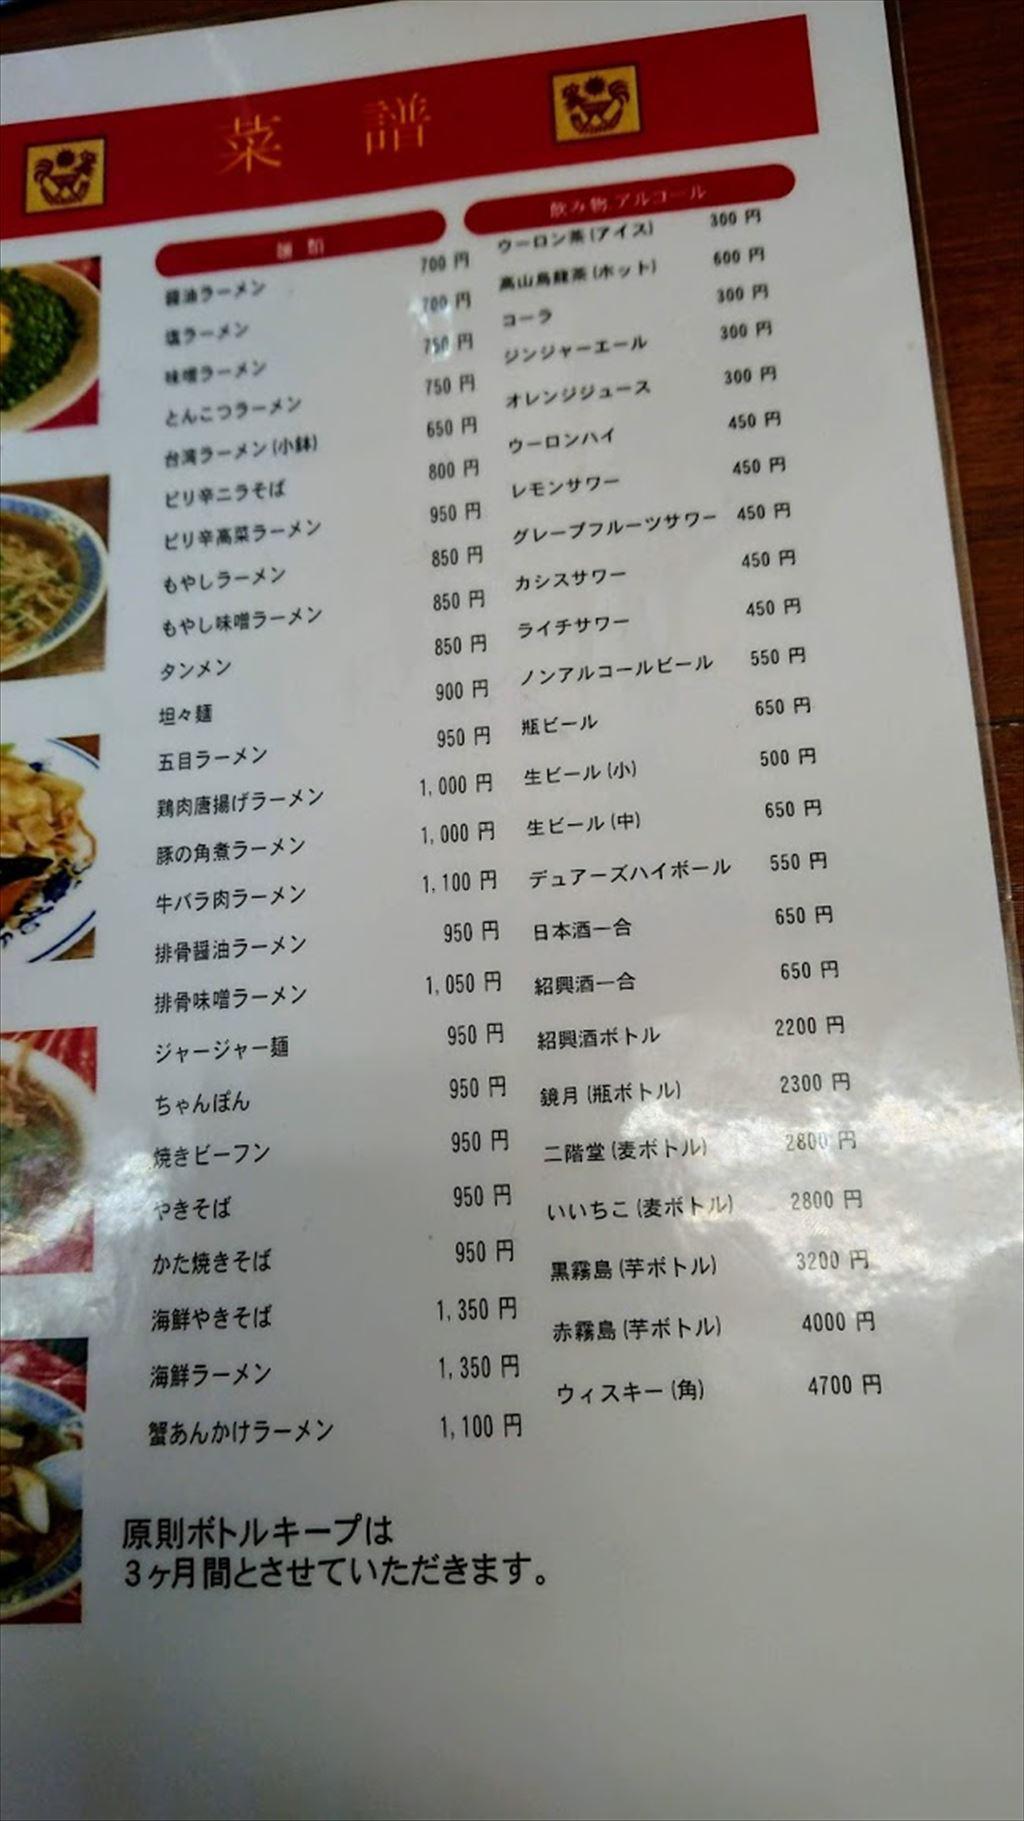 https://hayashida.jp/o/images2019-/PIC_20200106_122308_DSC_0011_R.JPG